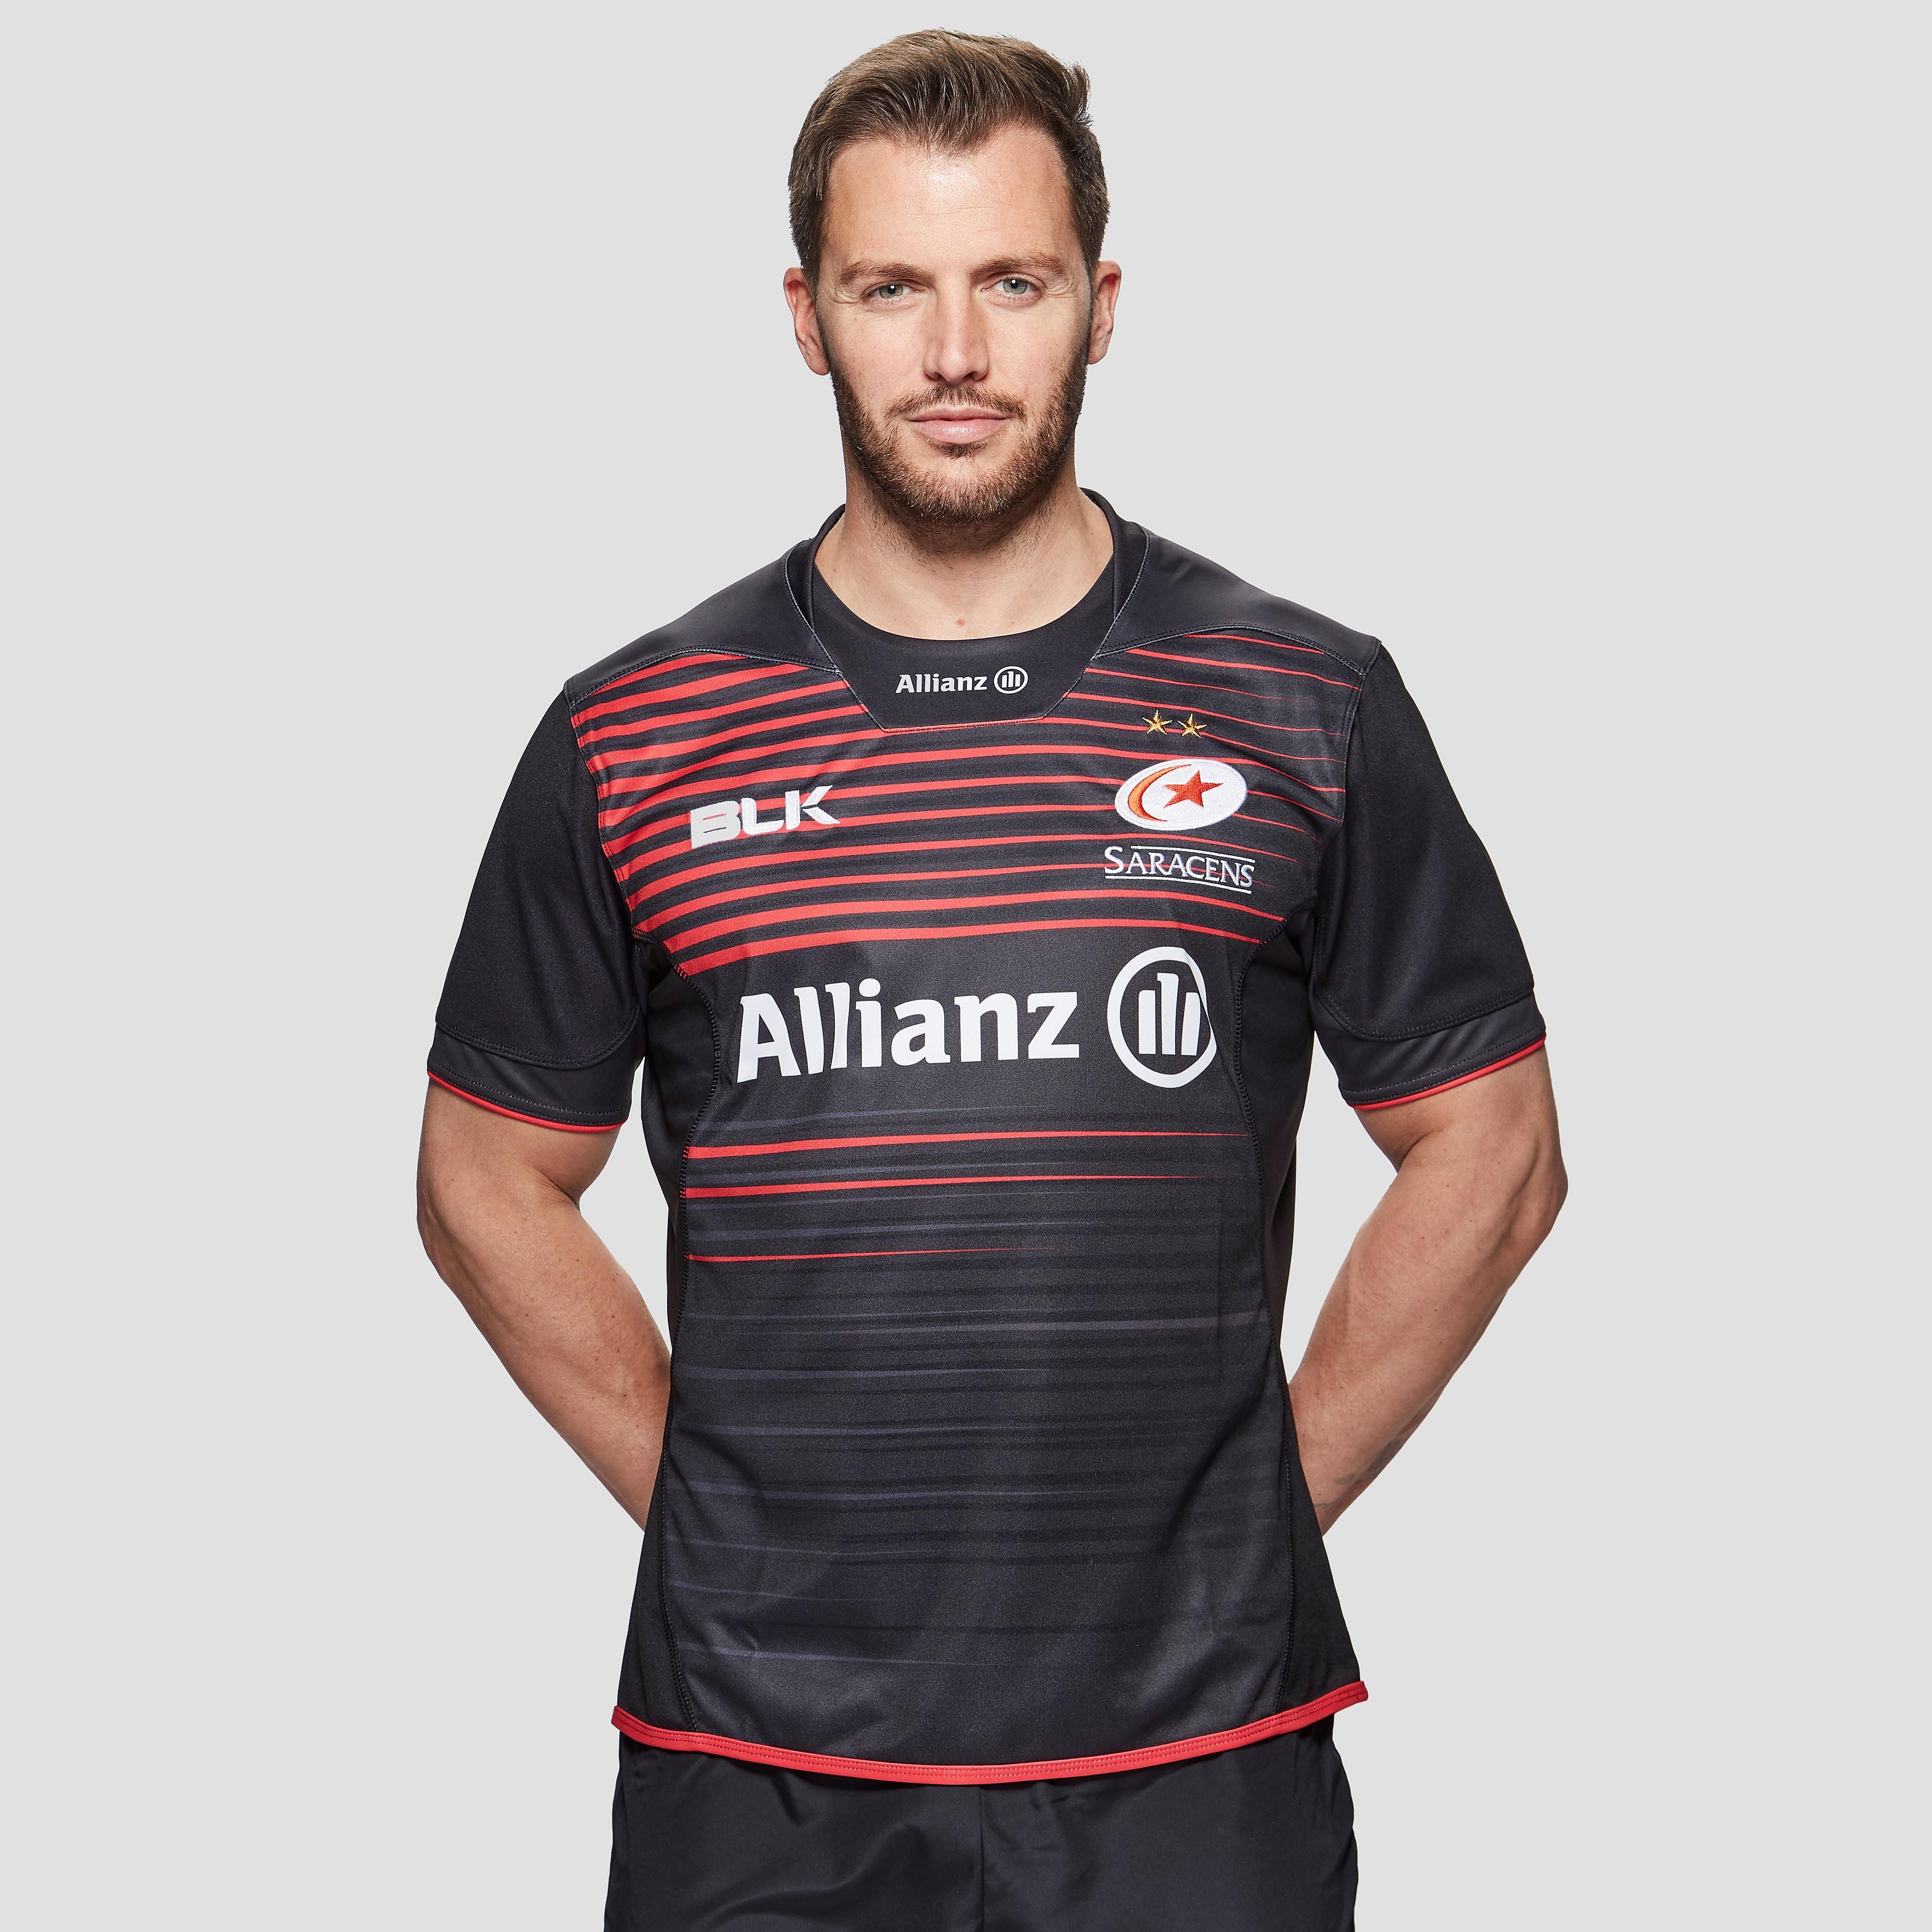 BLK Sport Sarcens 2017/18 Home Men's Replica Rugby Jersey